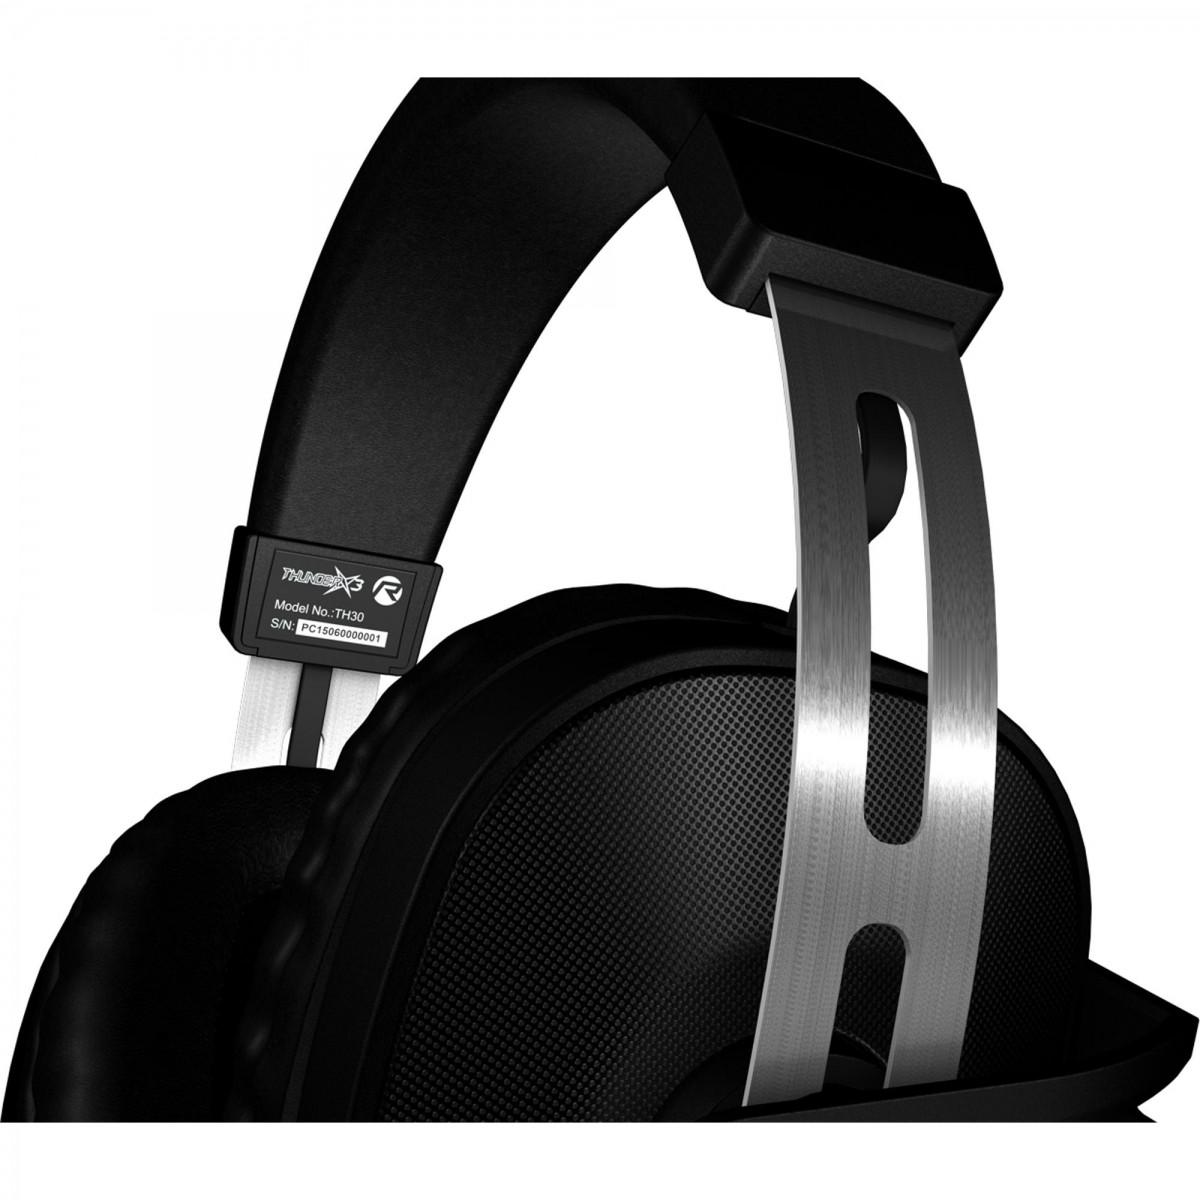 Fone de Ouvido com Microfone Gamer Profissional 2.1 TH30 Glow (LED Azul) Preto - ThunderX3